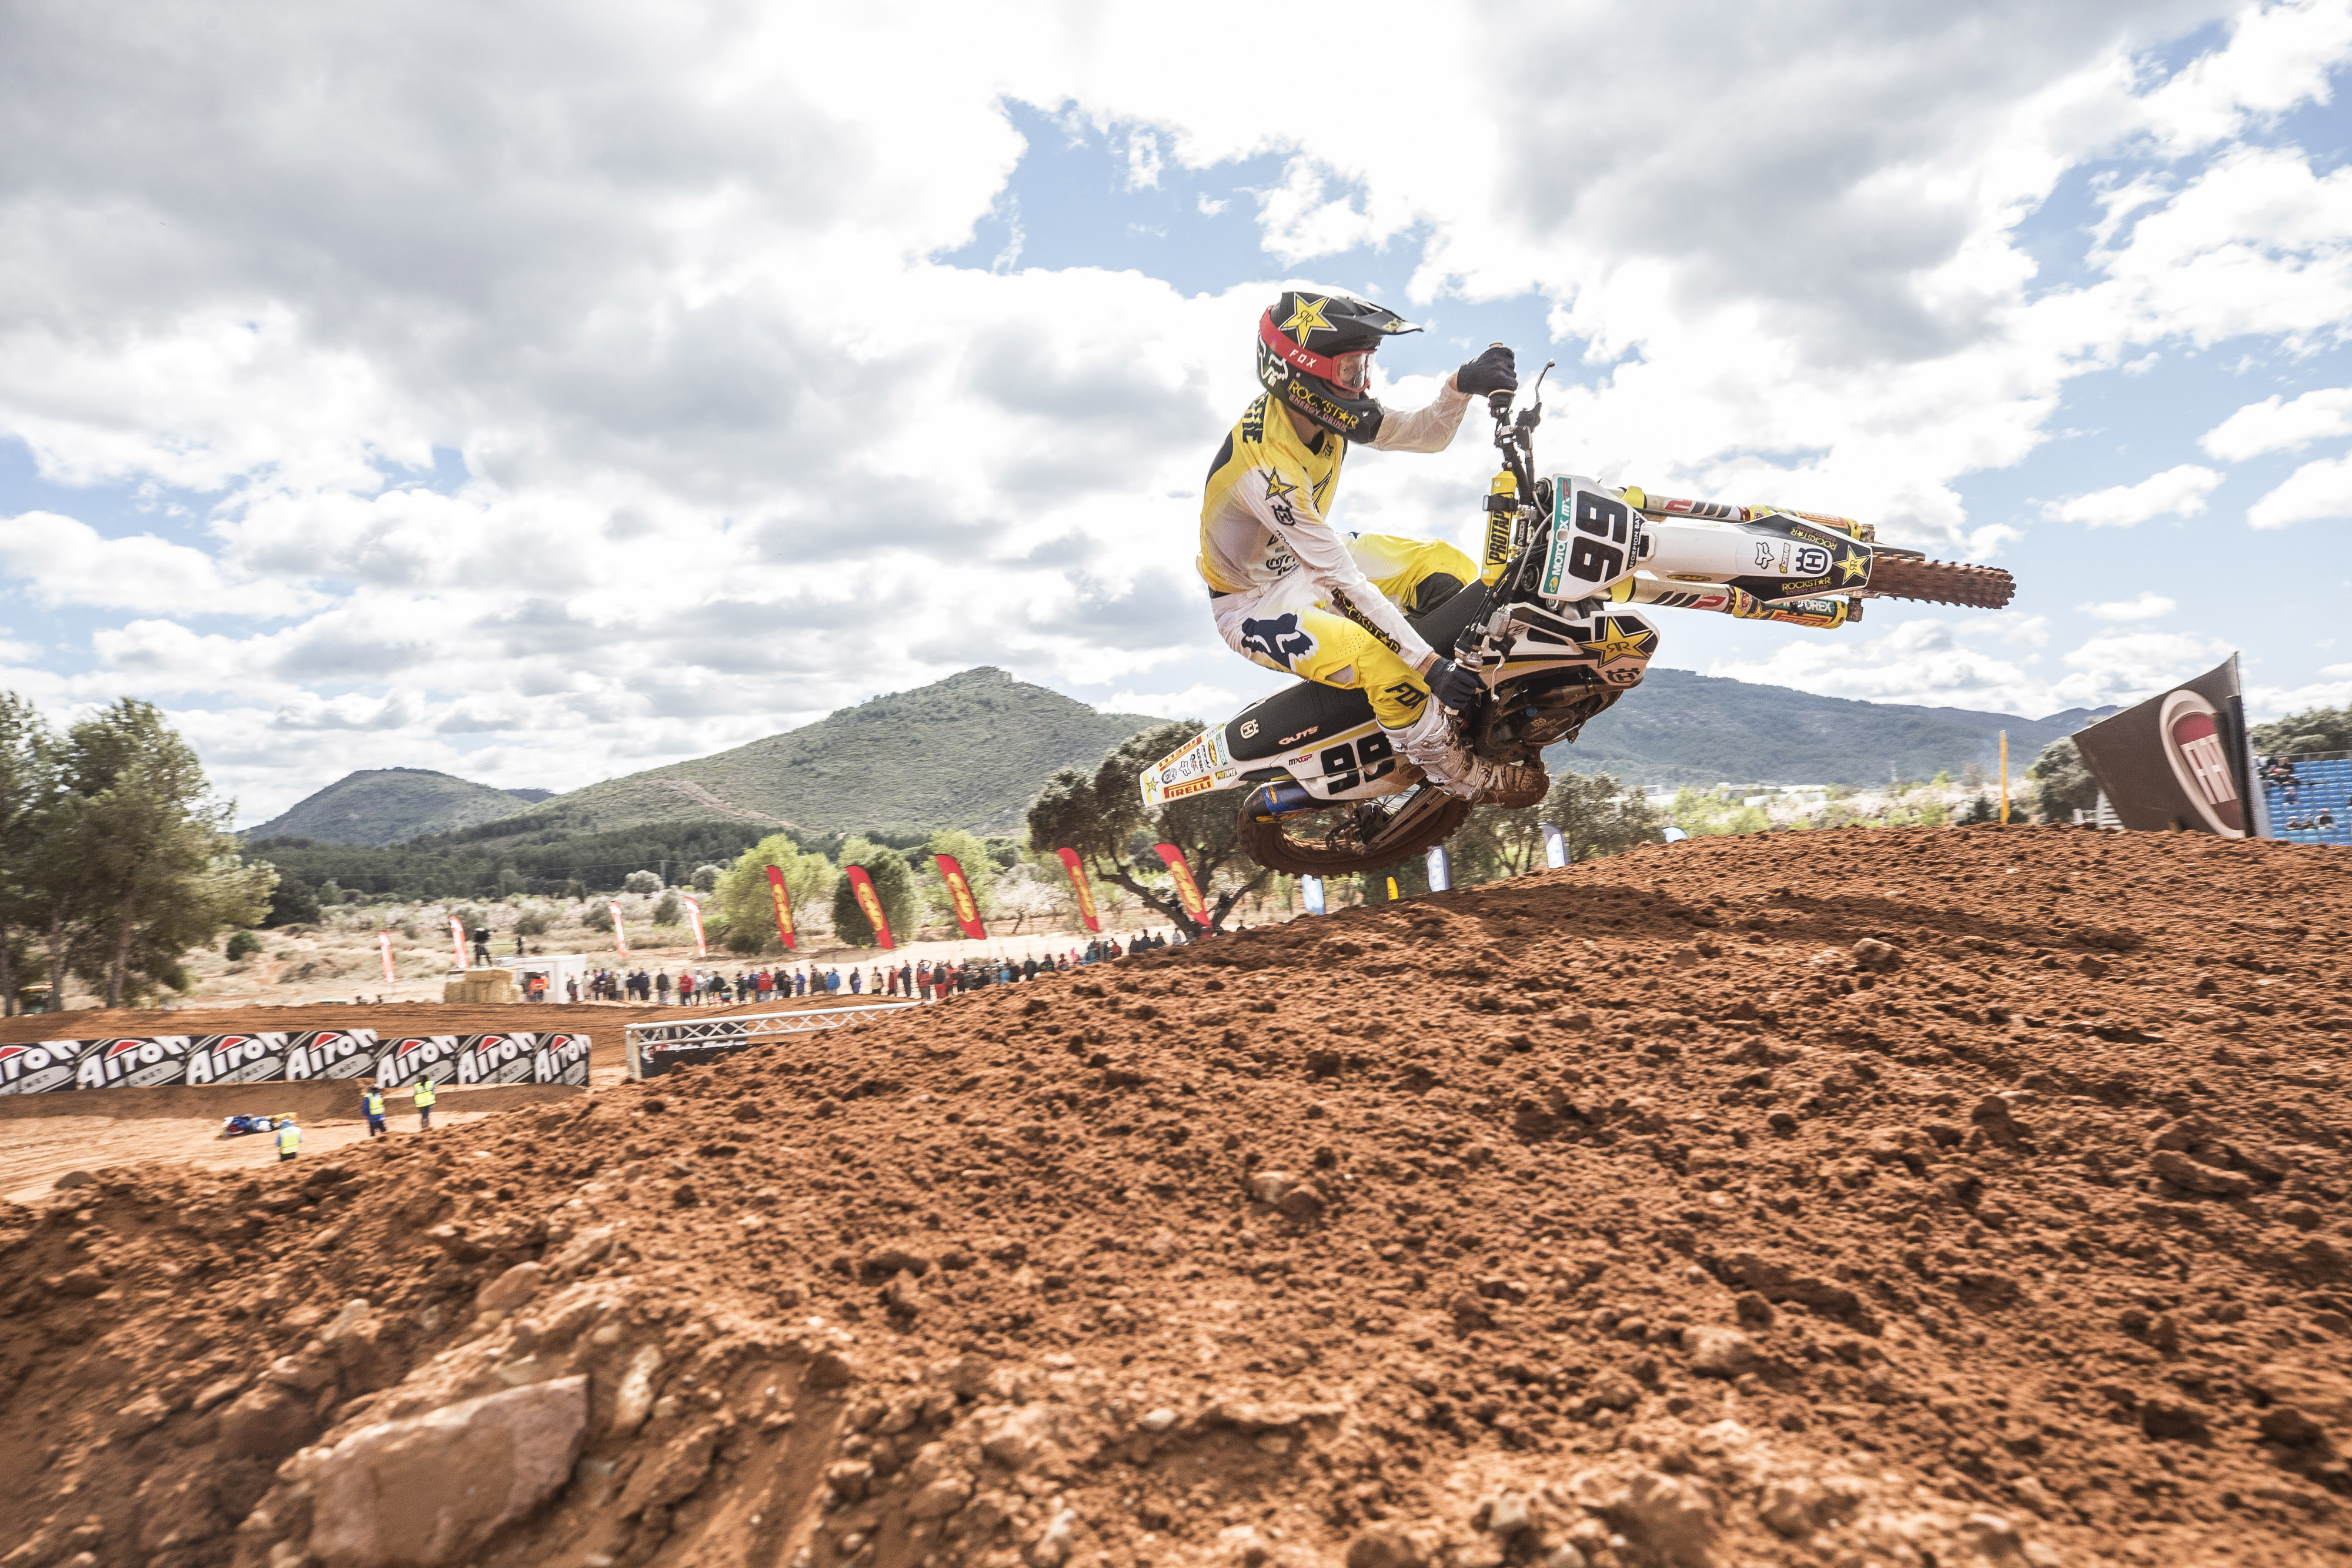 Max Anstie - Rockstar Energy Husqvarna Factory Racing-GP of La Comunitat Valenciana